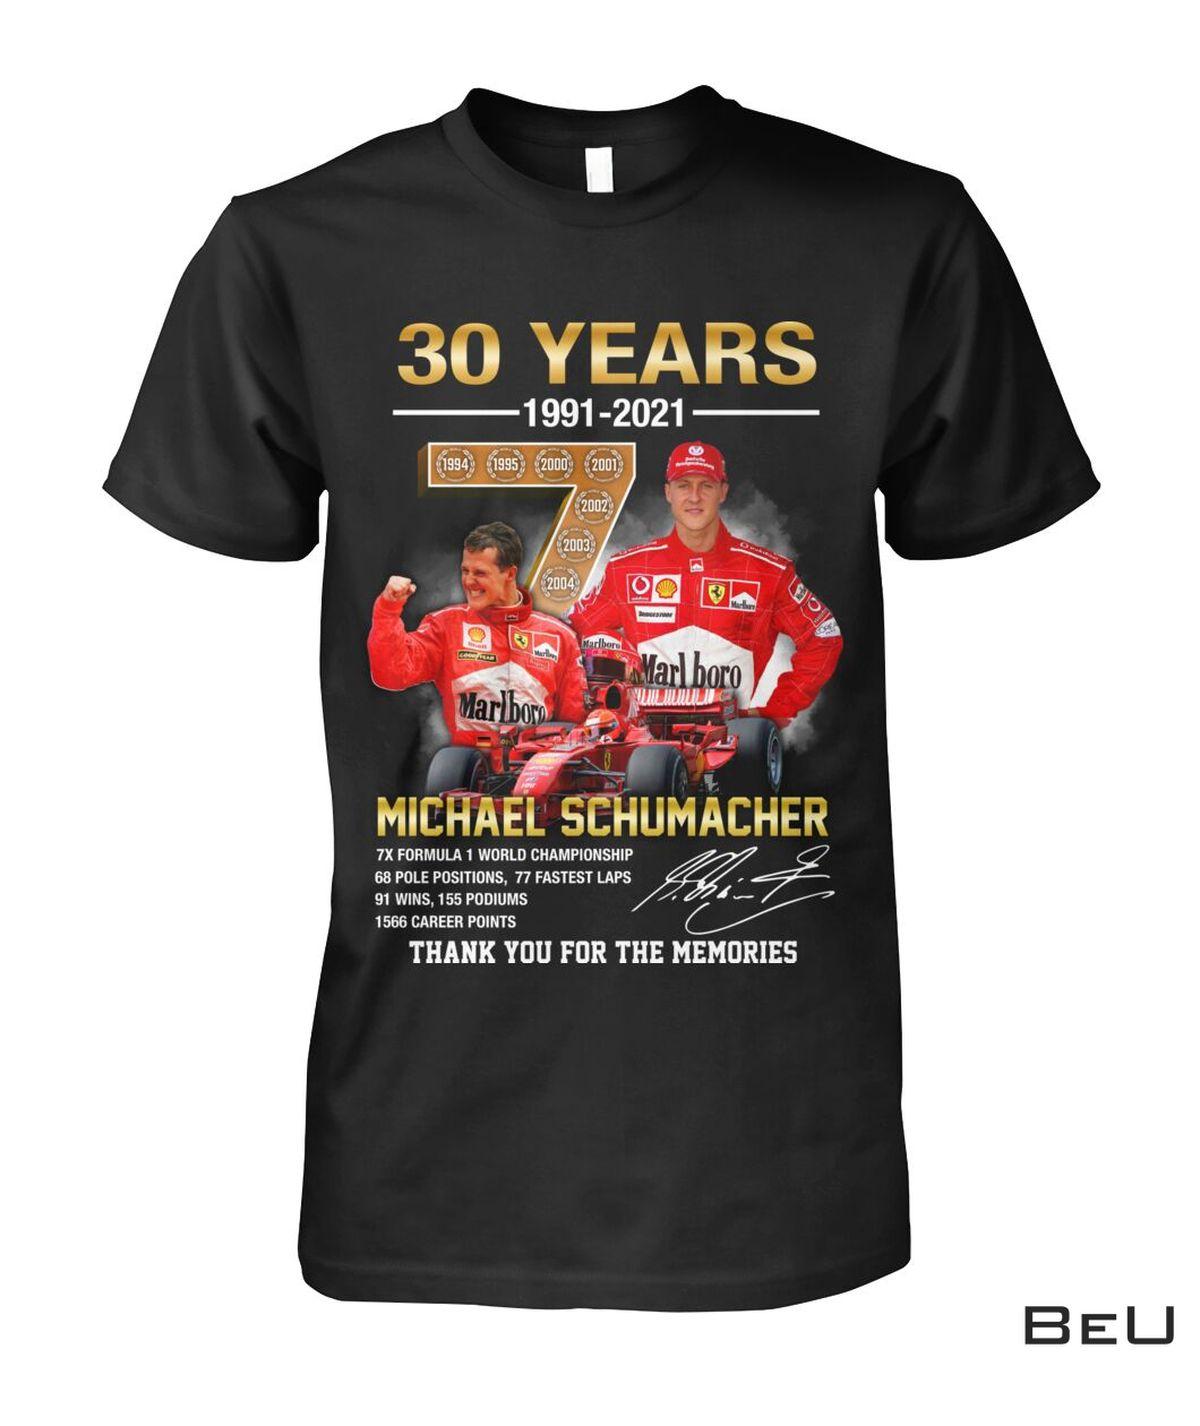 Michael Schumacher 30 Years F1 World Championship Shirt, hoodie, tank top